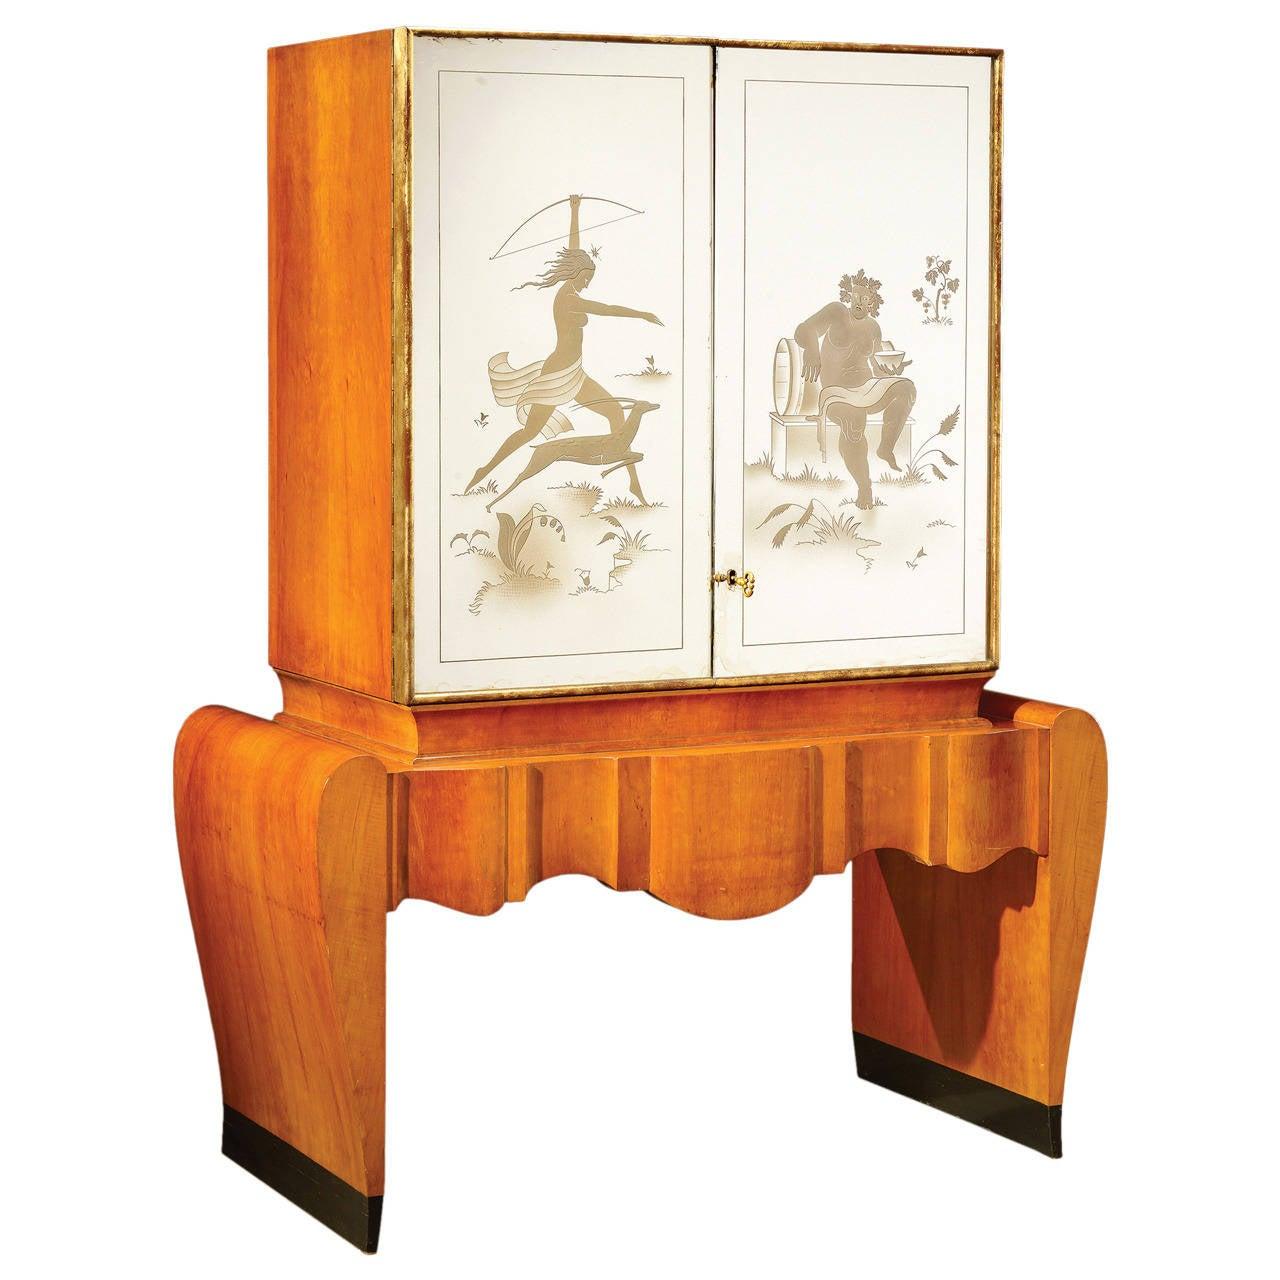 Stunning art deco italian bar cabinet for sale at 1stdibs for Art deco bar furniture